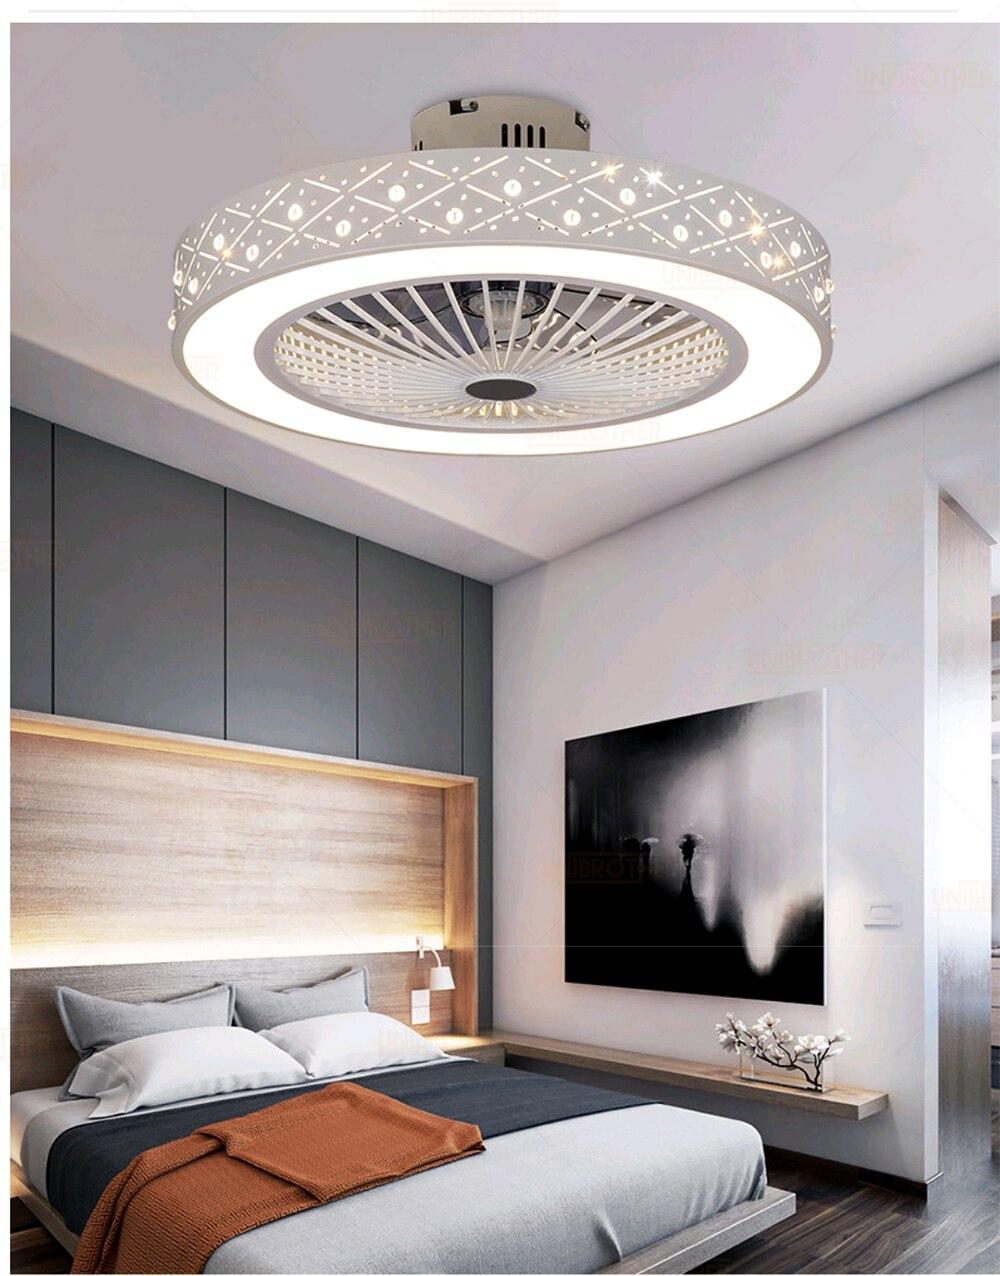 55 Cm Ceiling Fan Smart Remote Control